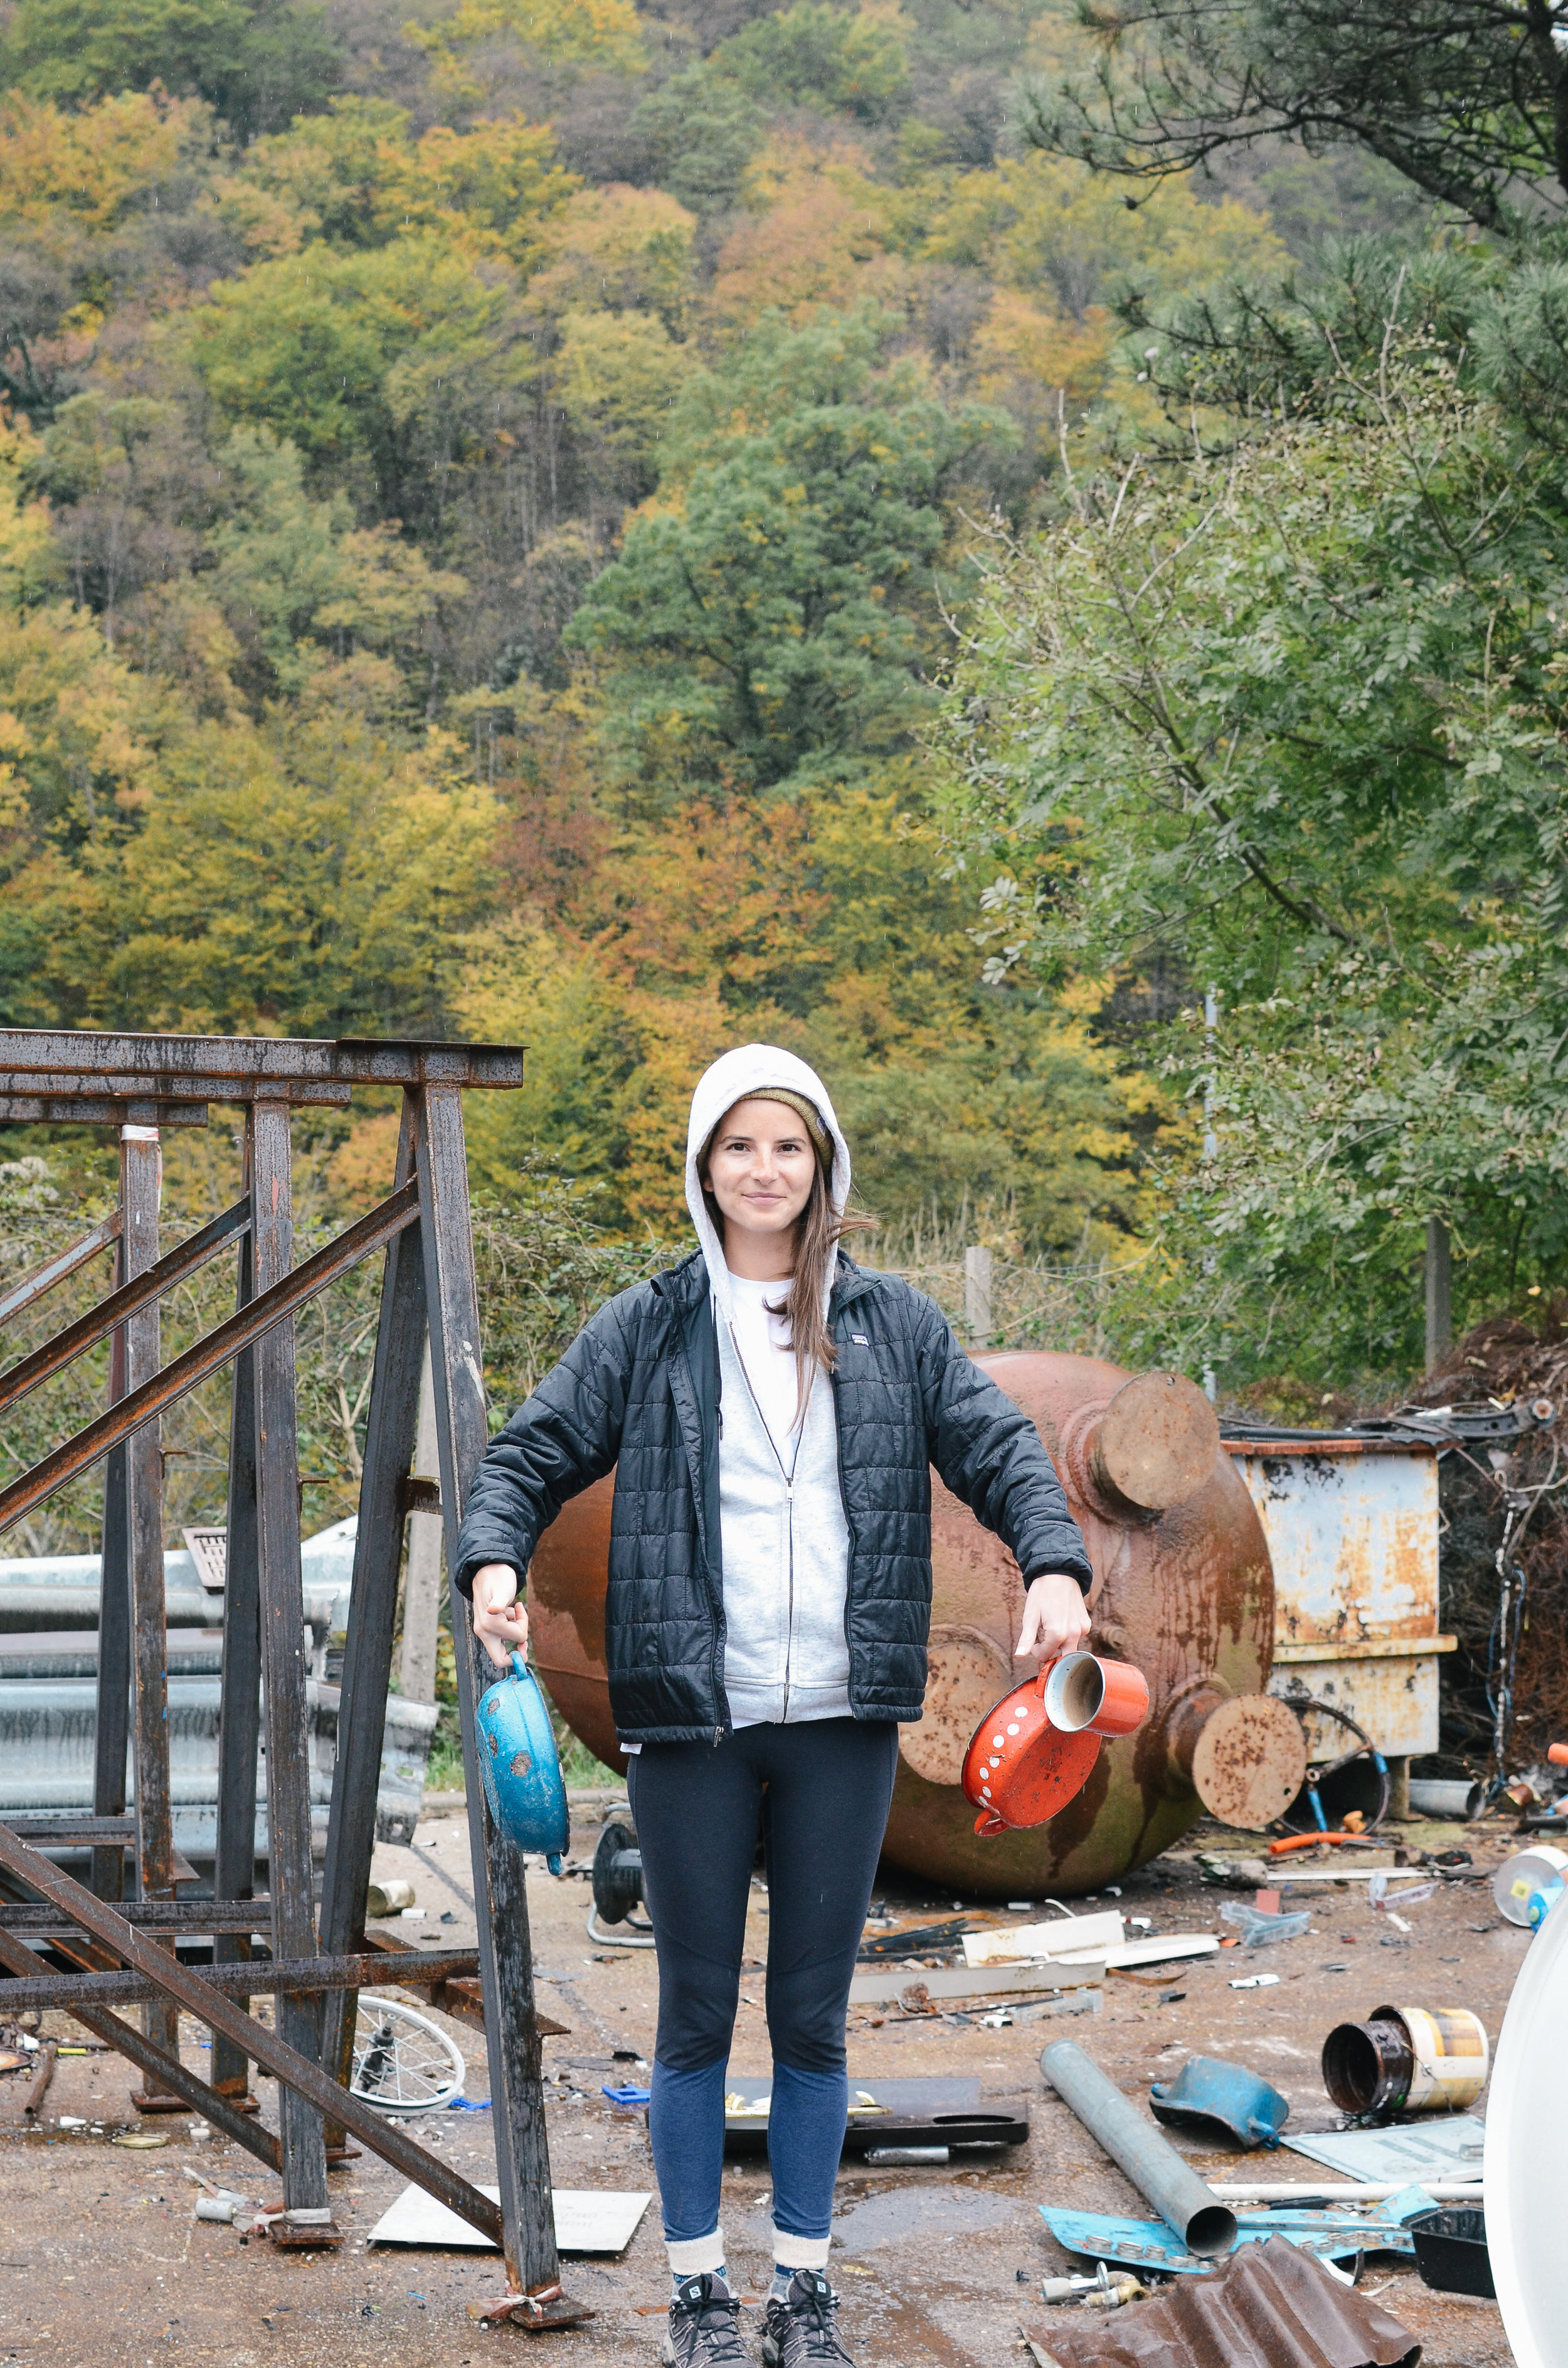 ^^ scenes from the junkyard